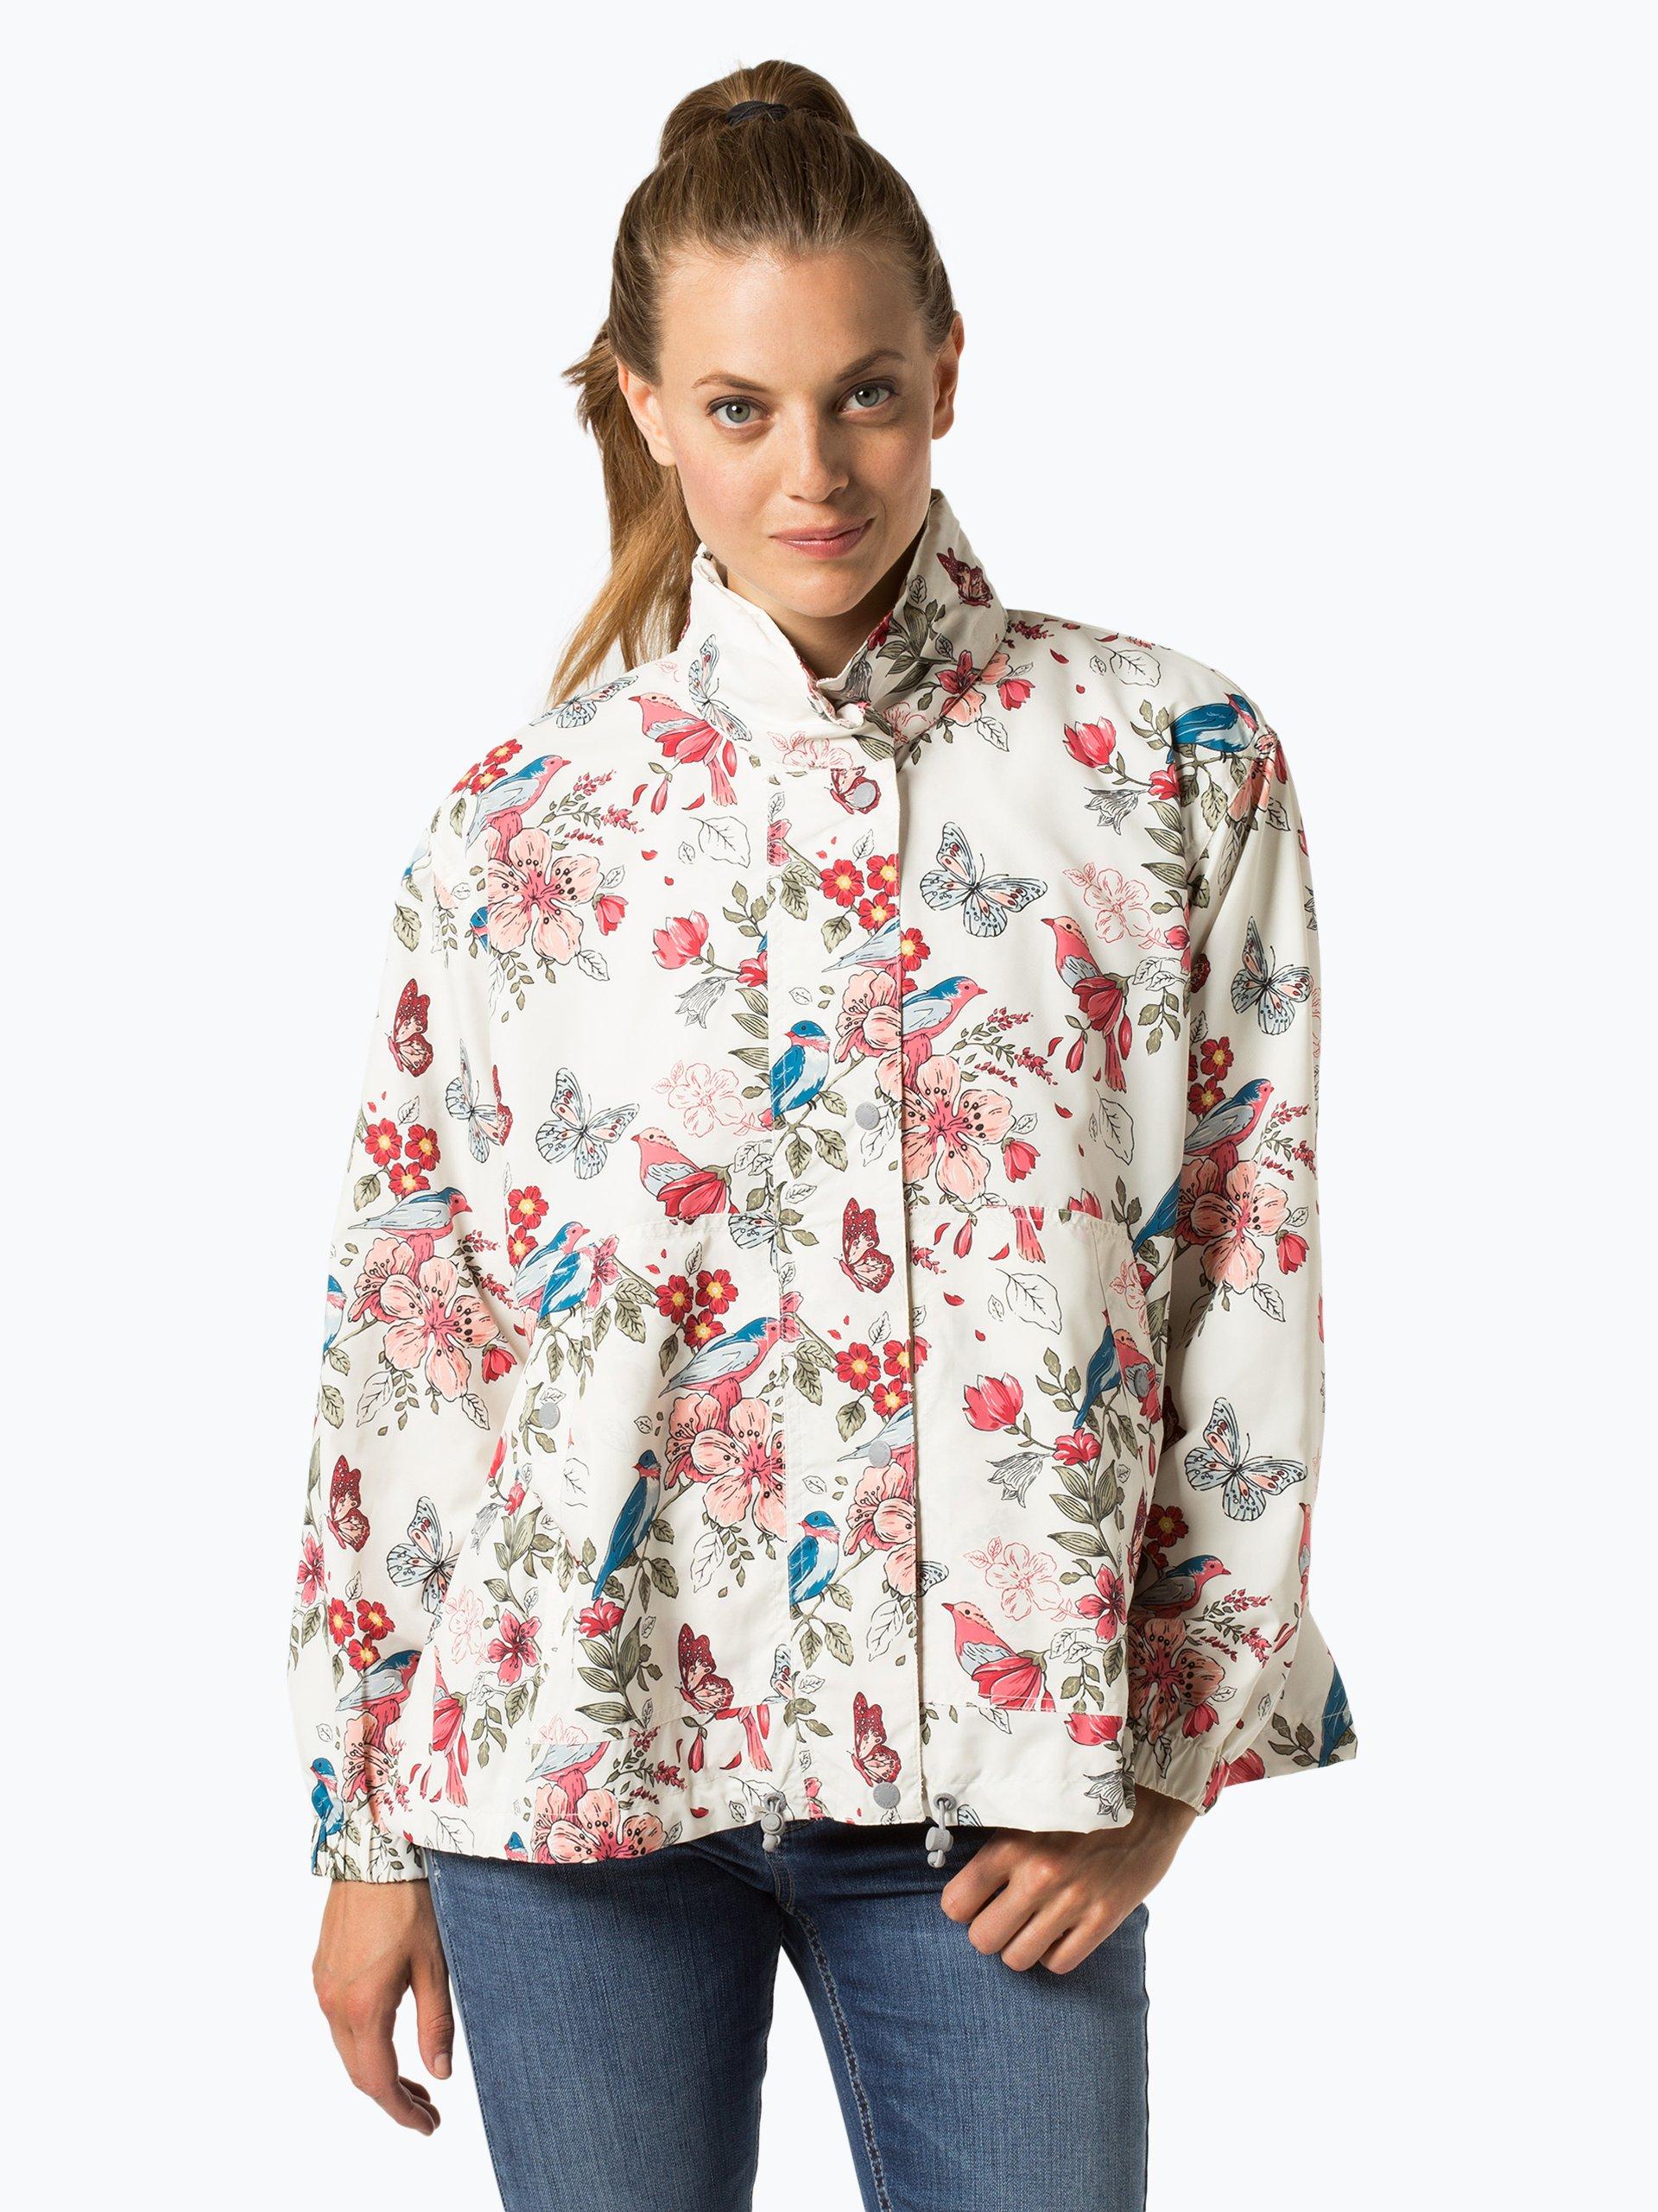 pepe jeans damen jacke jakna ecru rosa gemustert online kaufen peek und cloppenburg de. Black Bedroom Furniture Sets. Home Design Ideas